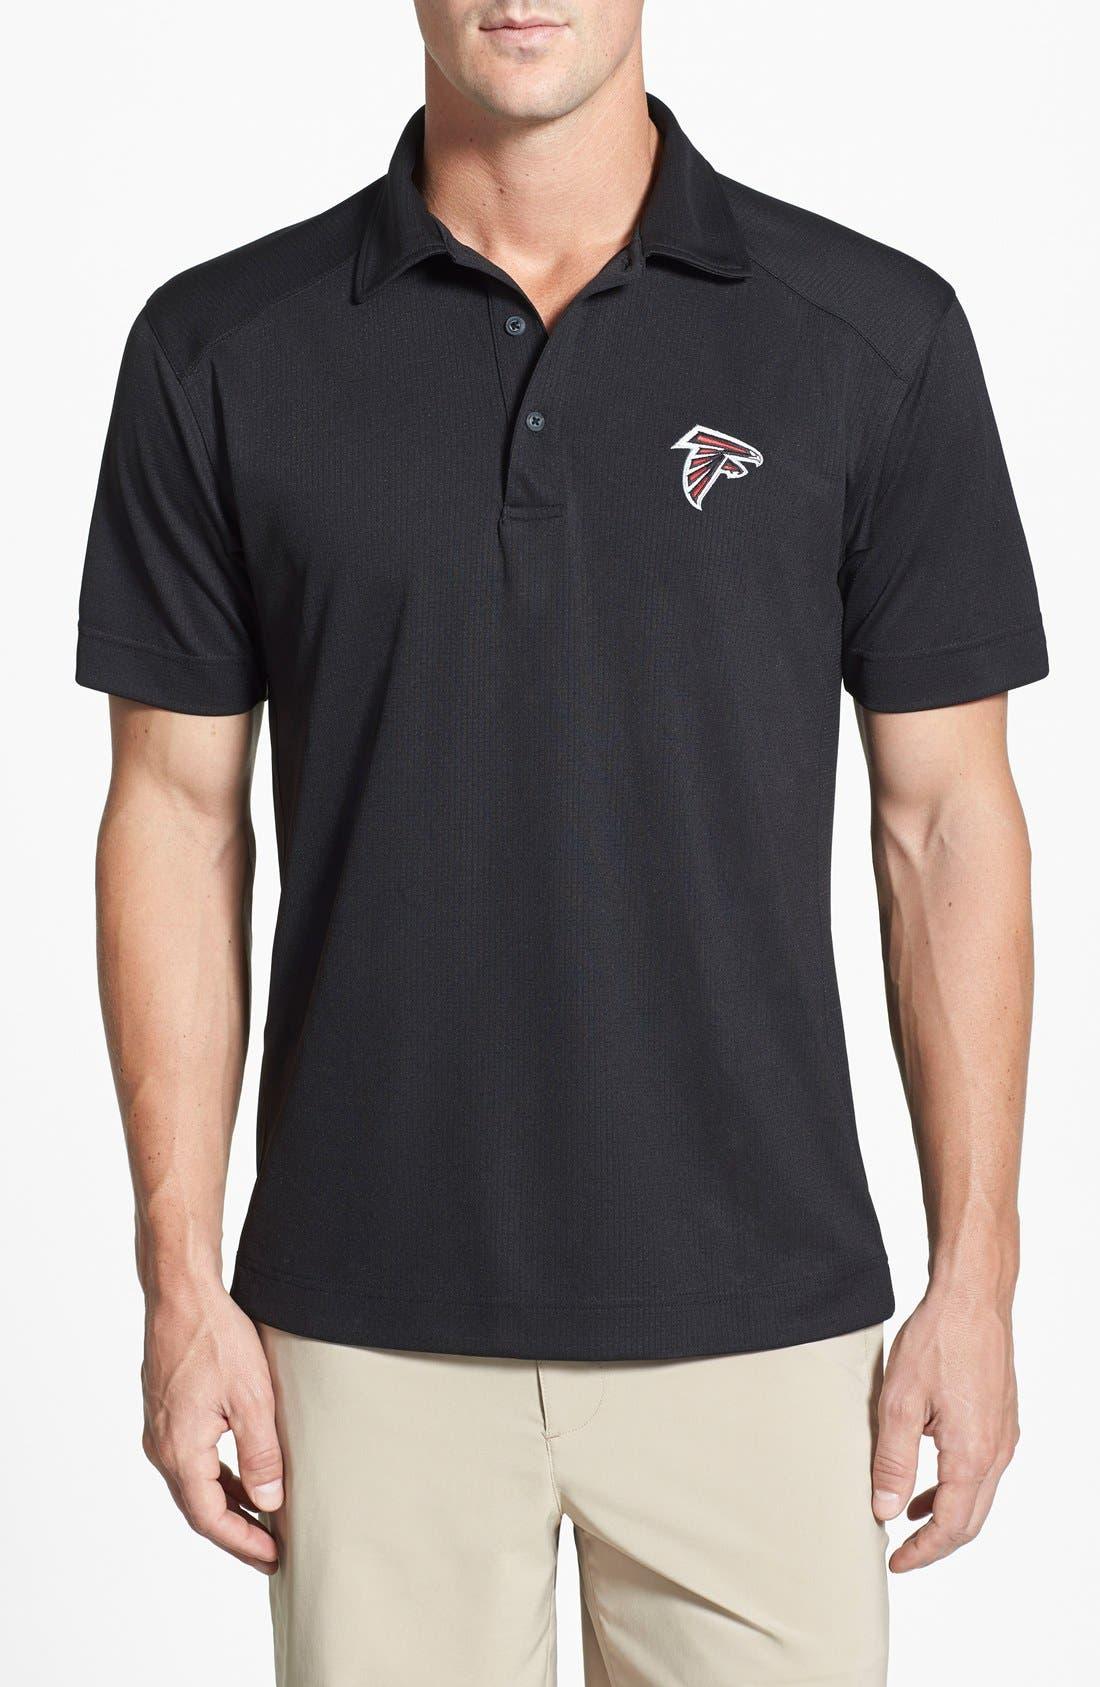 Atlanta Falcons - Genre DryTec Moisture Wicking Polo,                         Main,                         color, Black